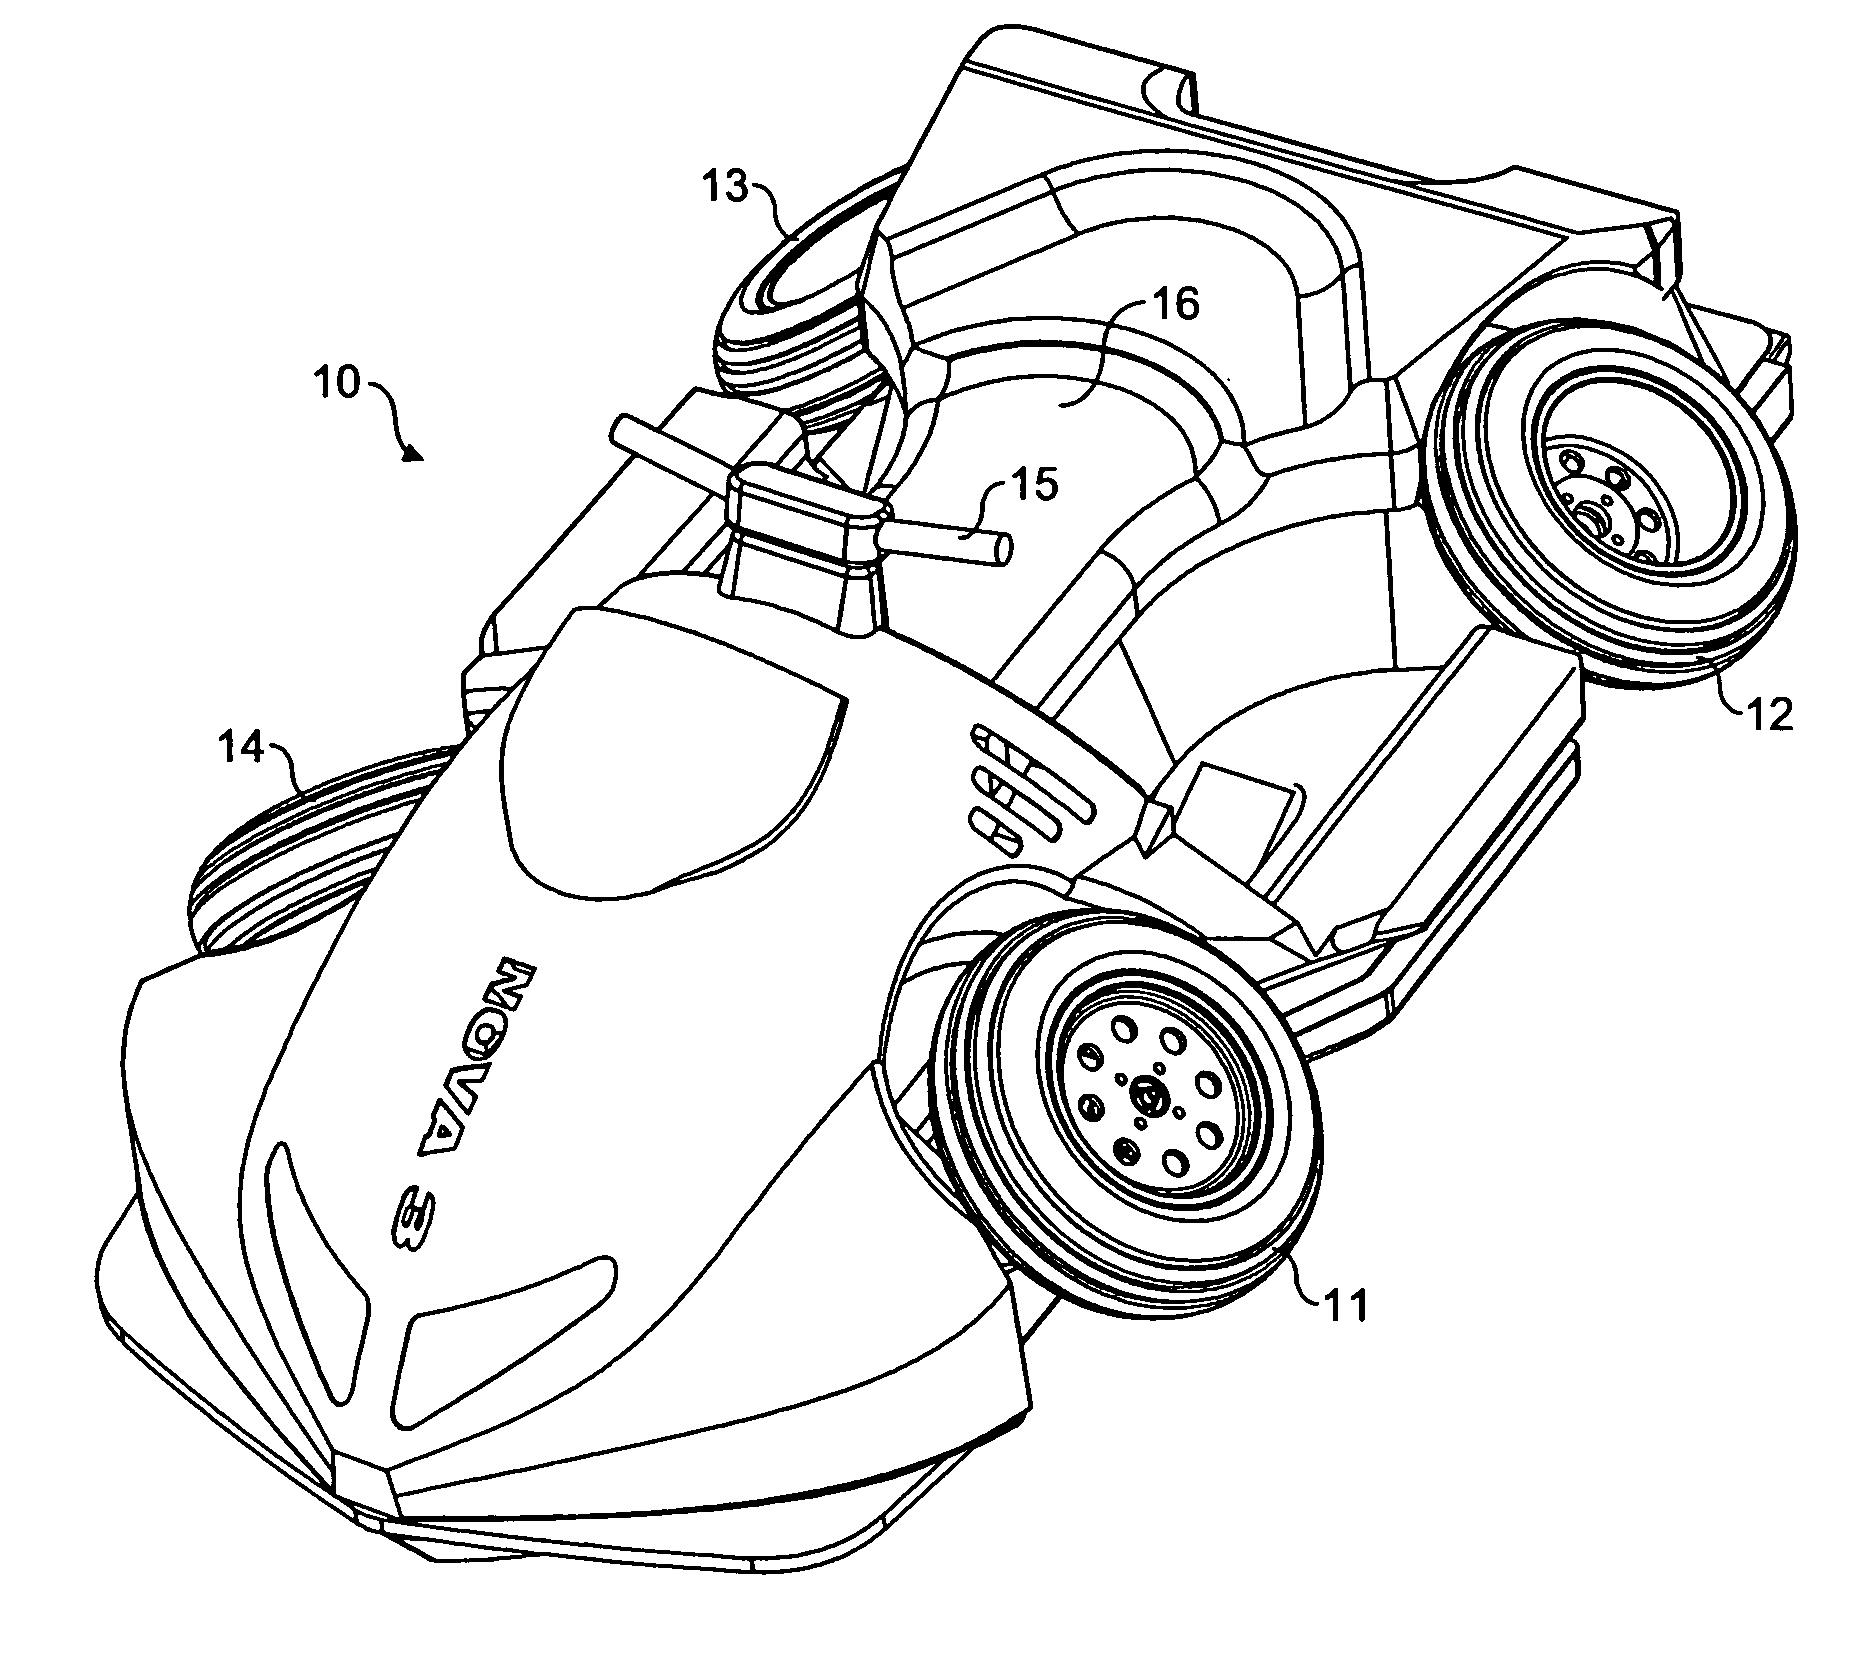 Honda gx 120 wiring diagram moreover briggs stratton 13 hp engine diagram further wiring diagram for